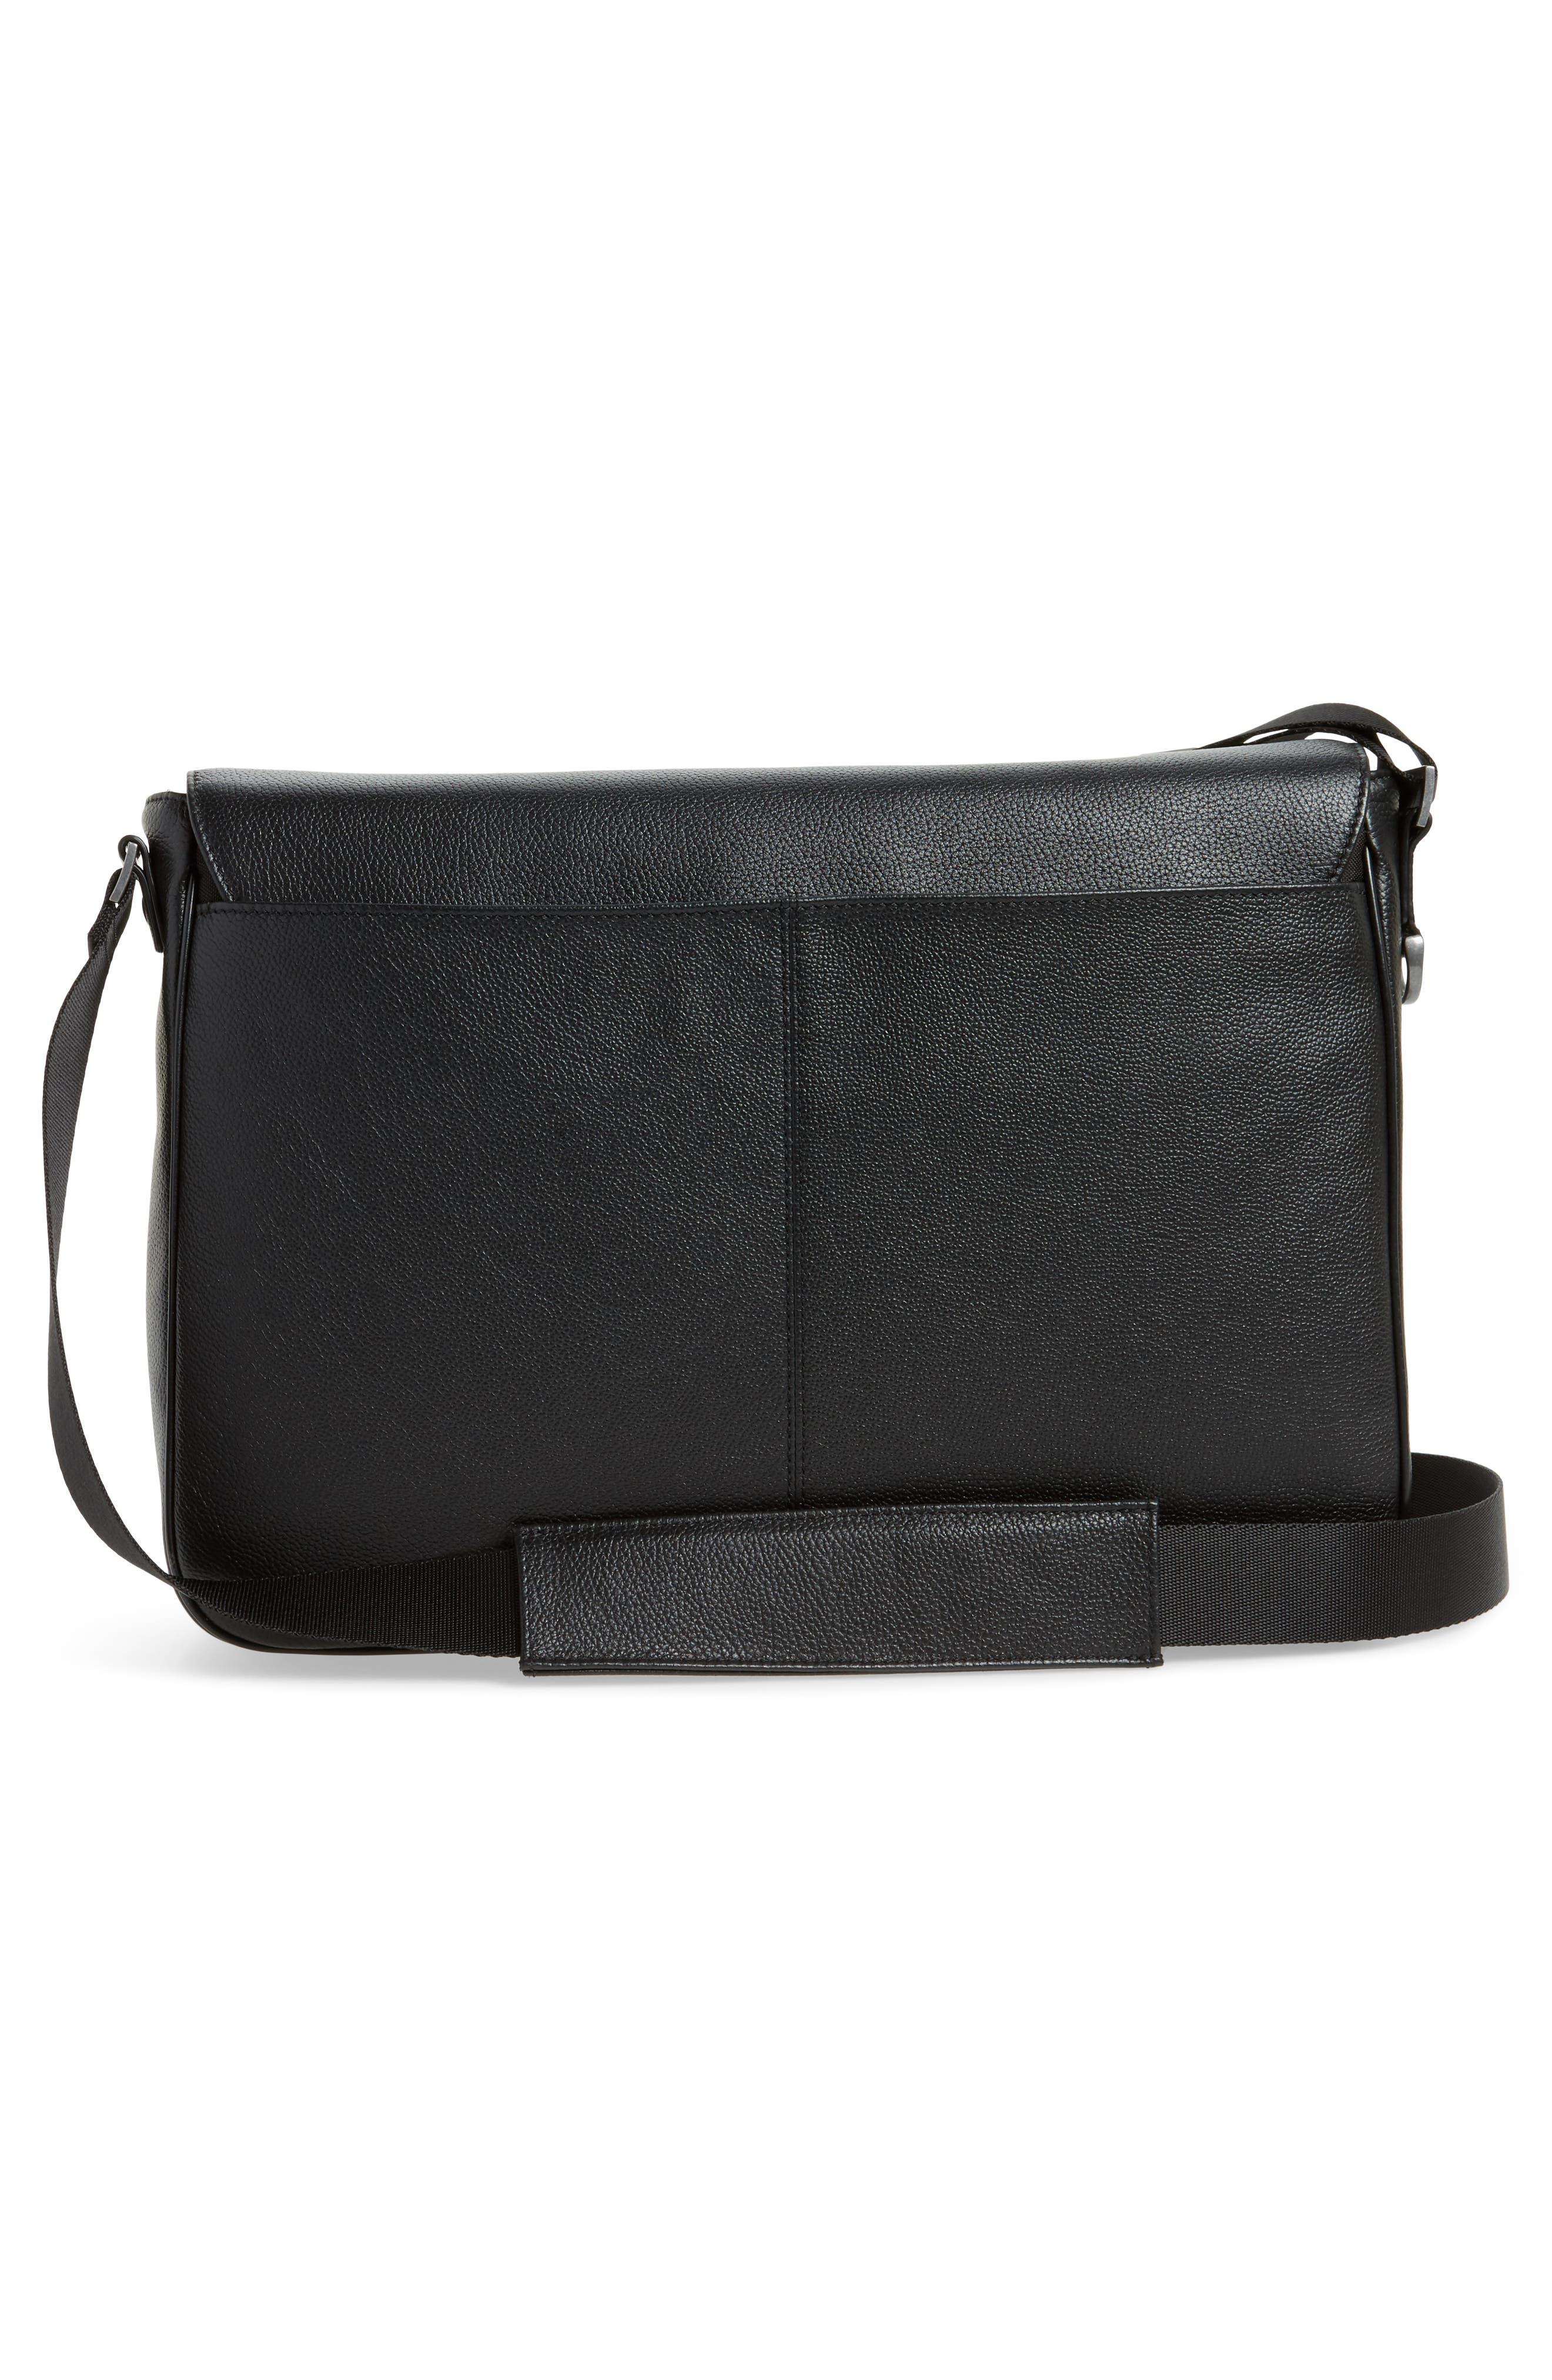 Midland Leather Messenger Bag,                             Alternate thumbnail 3, color,                             001